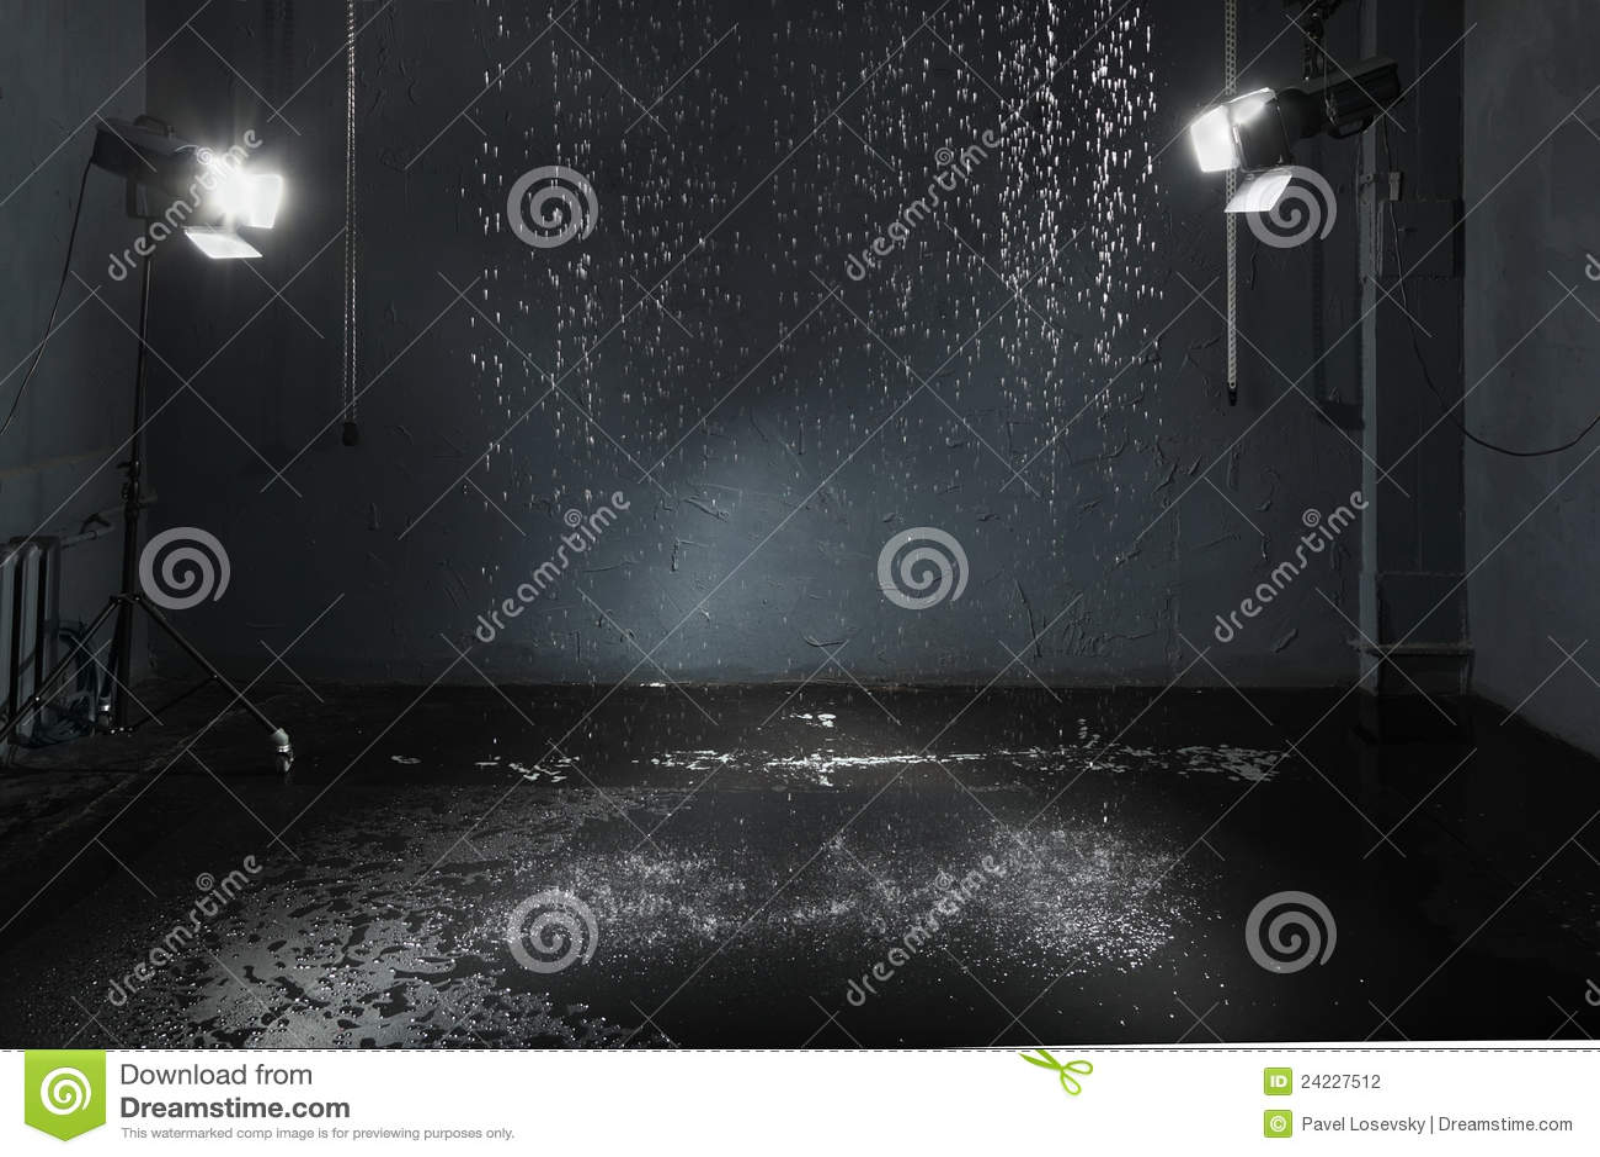 Rain In Studio Lighting System Stock Photography Image